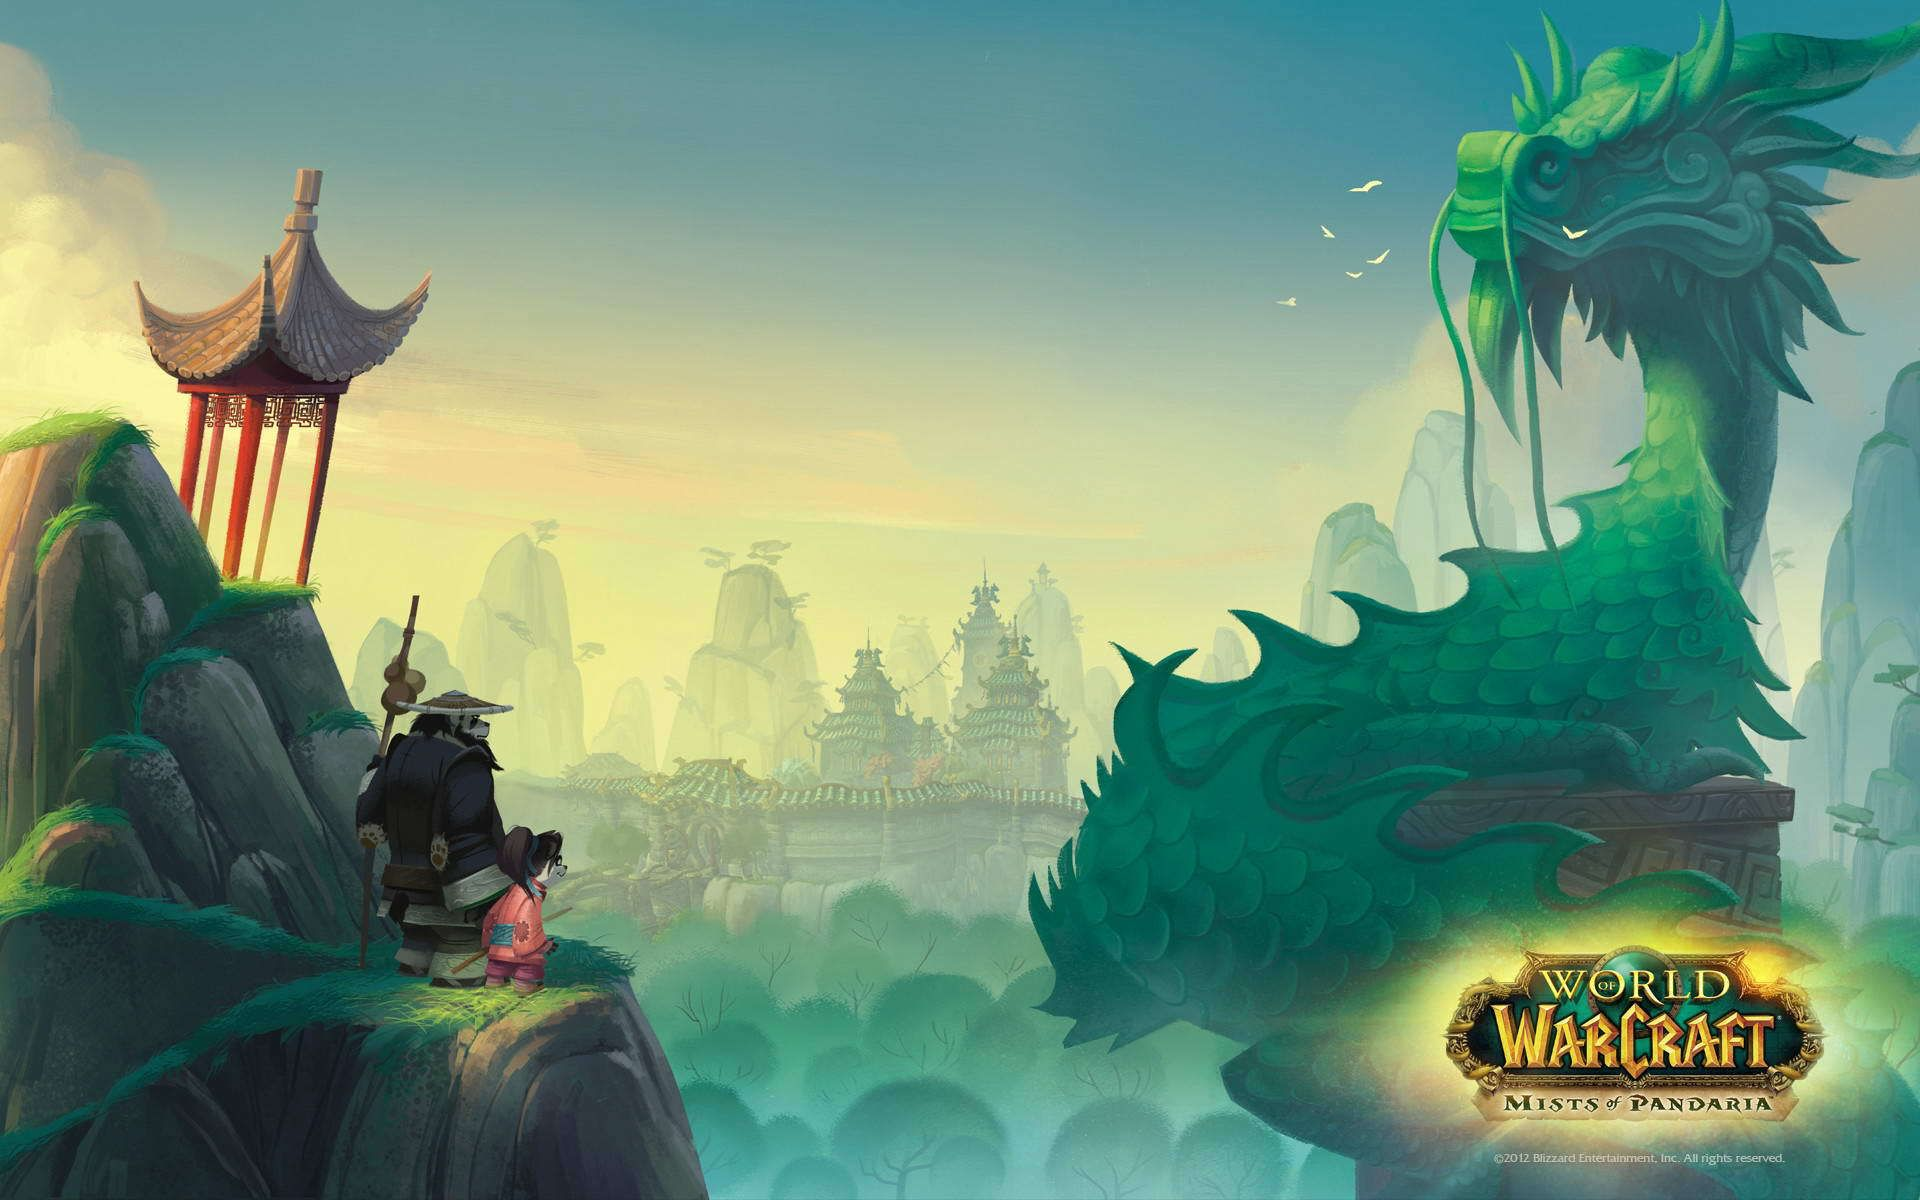 World Of Warcraft Wallpaper Background On Wallpaper 1080p Hd World Of Warcraft Wallpaper World Of Warcraft Wallpaper Backgrounds